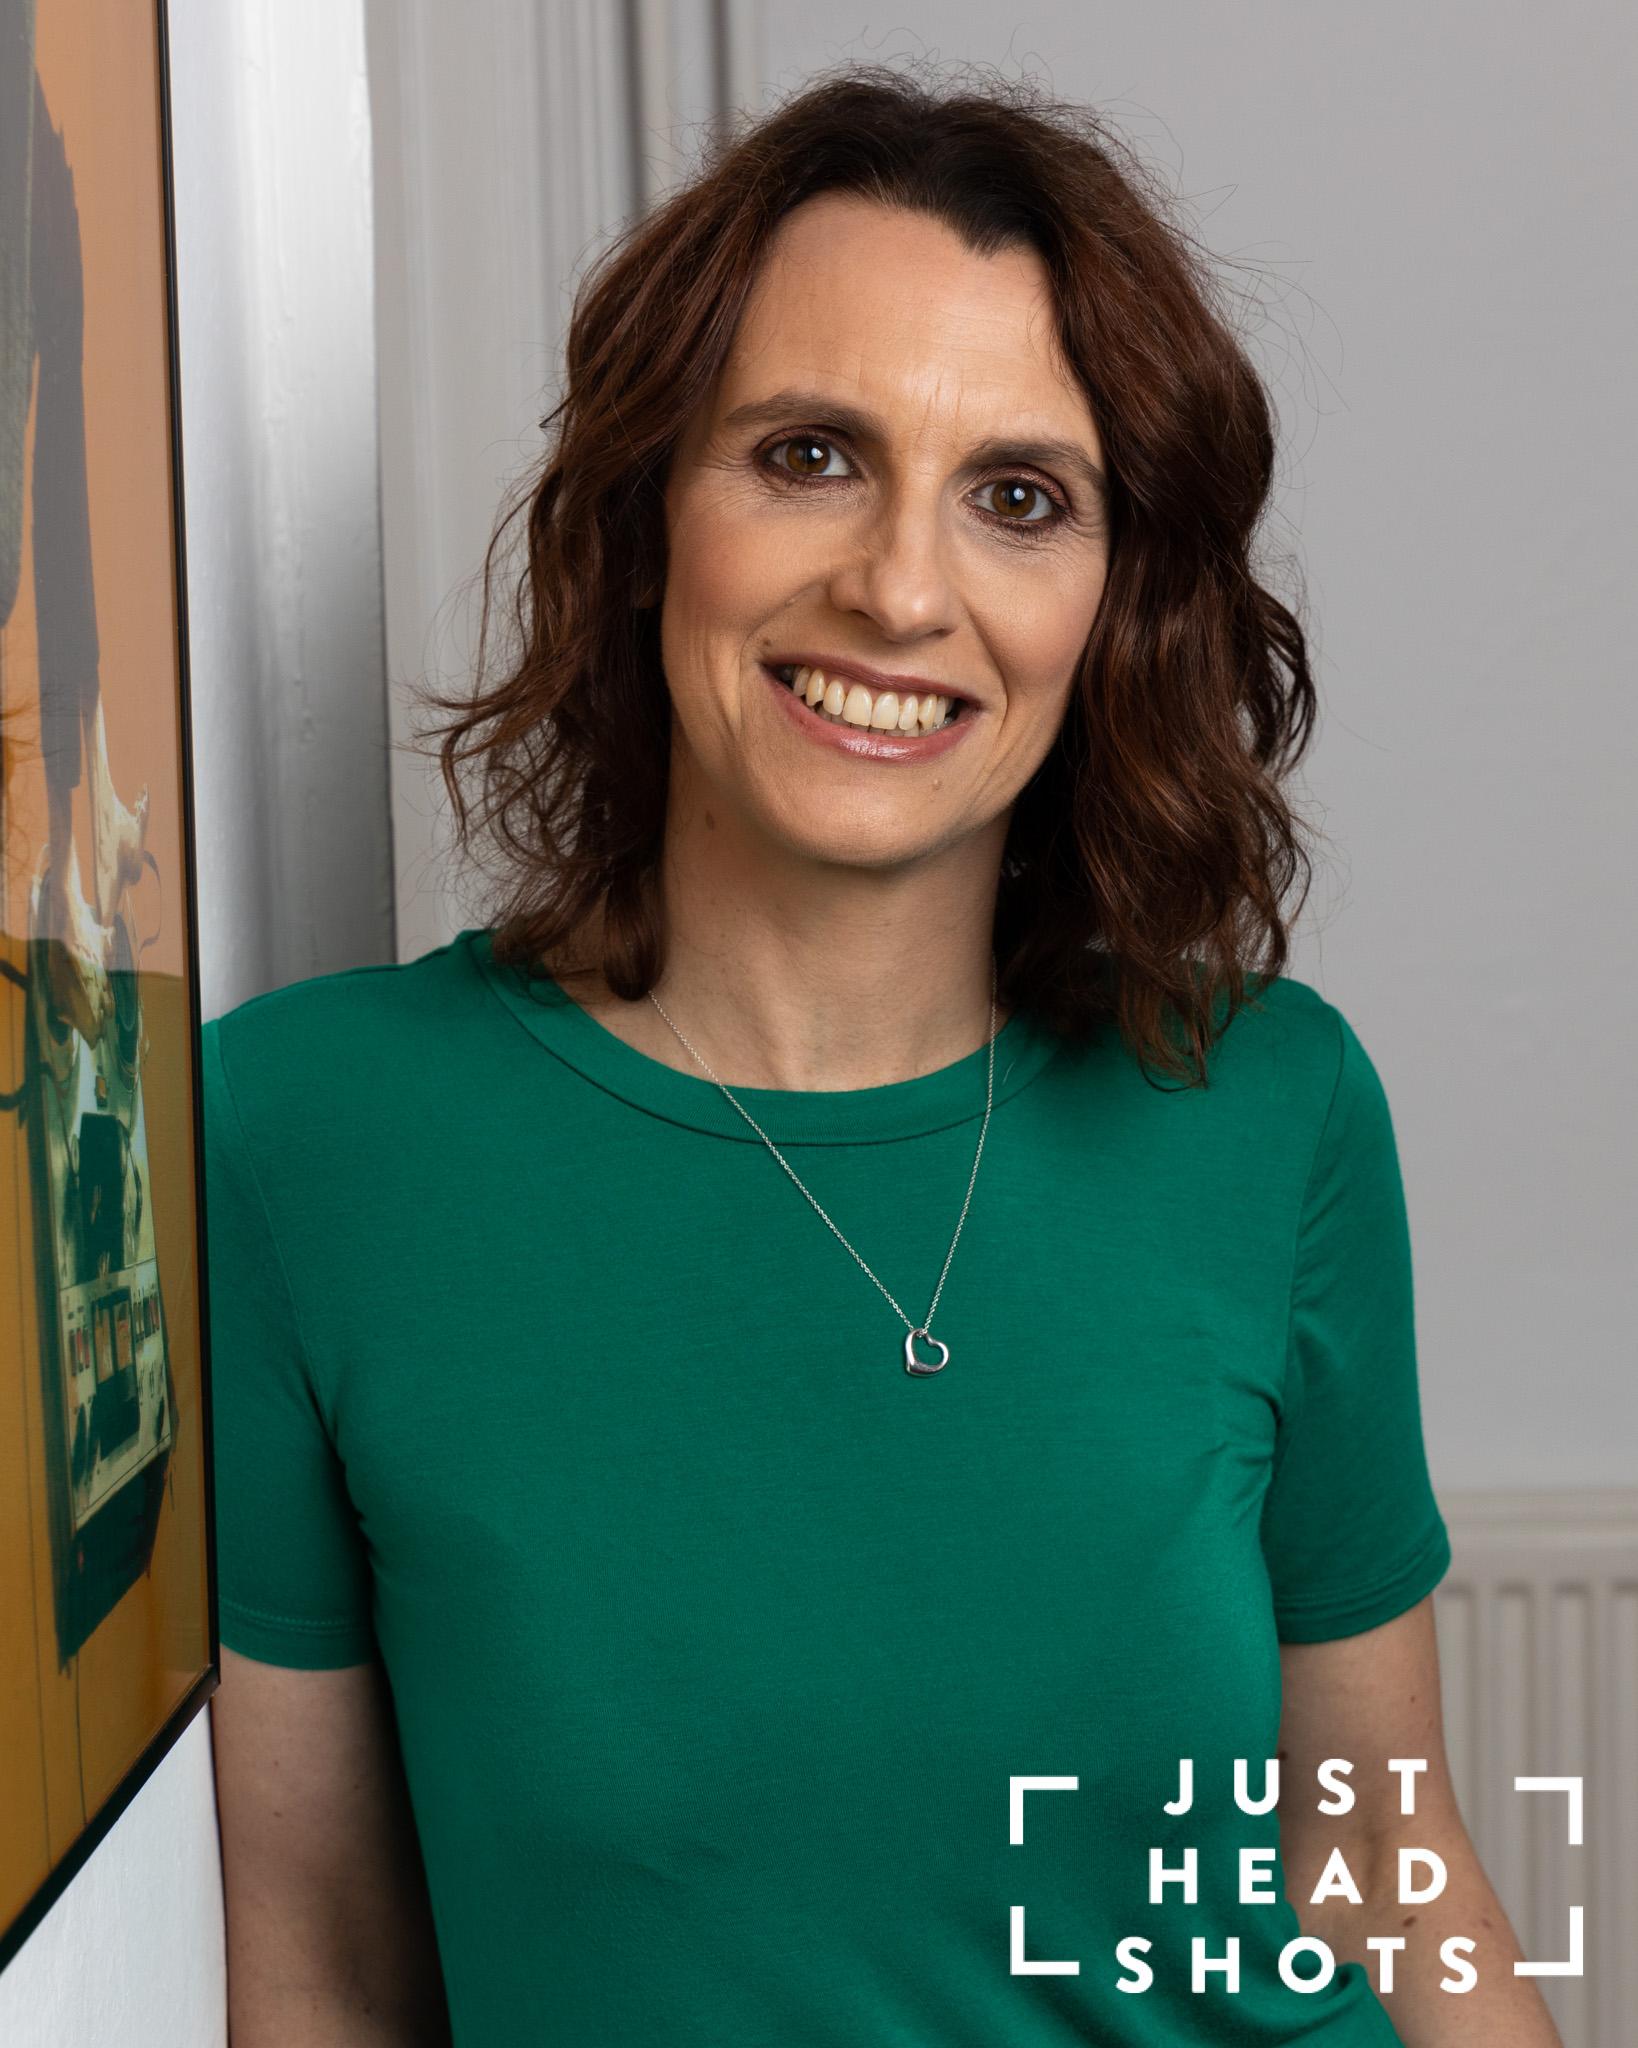 Professional headshot of Amanda Bate taken at Wynne Marketing in Chester